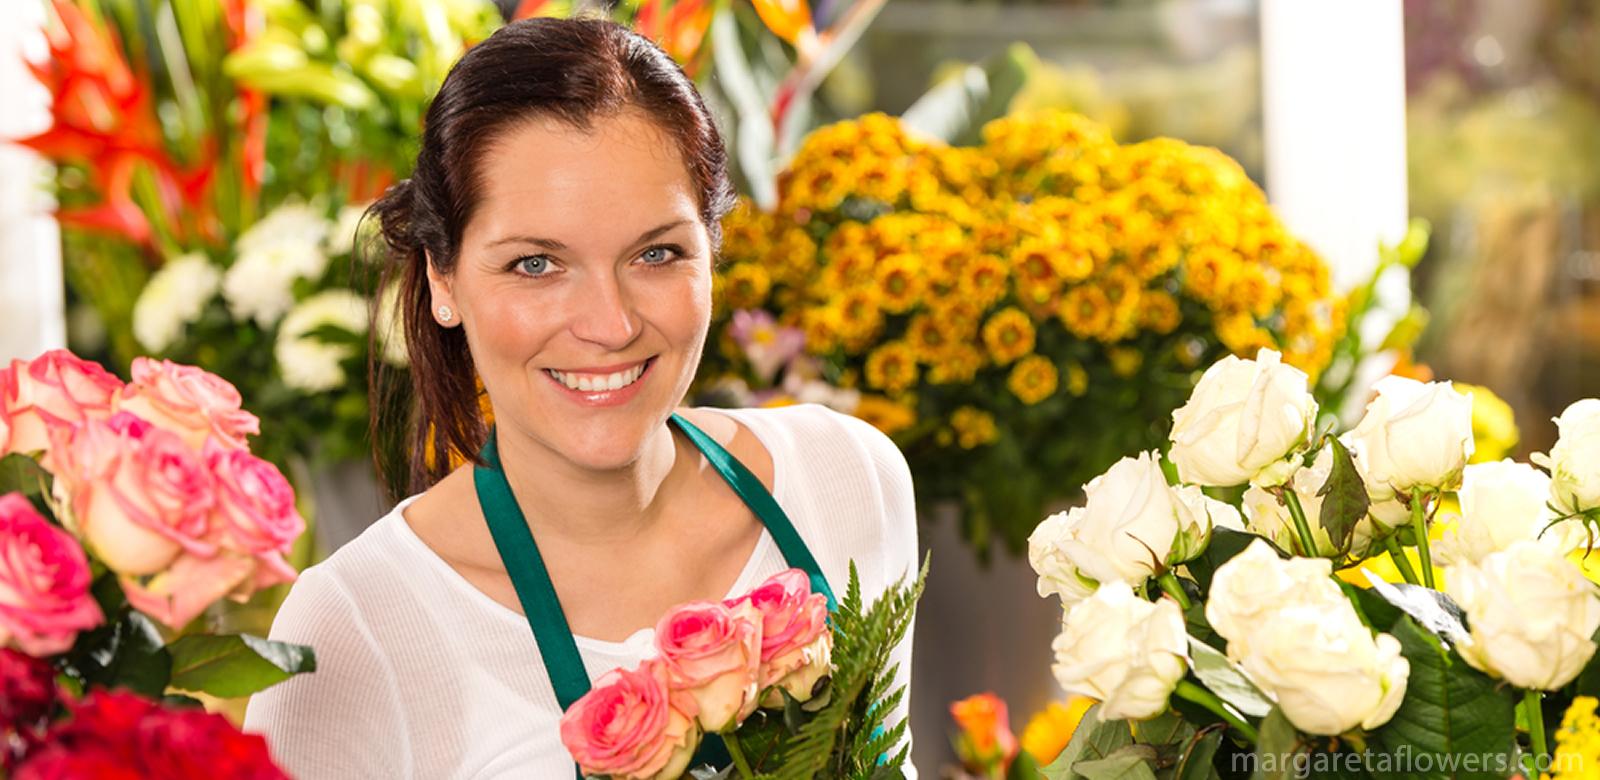 Roses-ecuador flowers